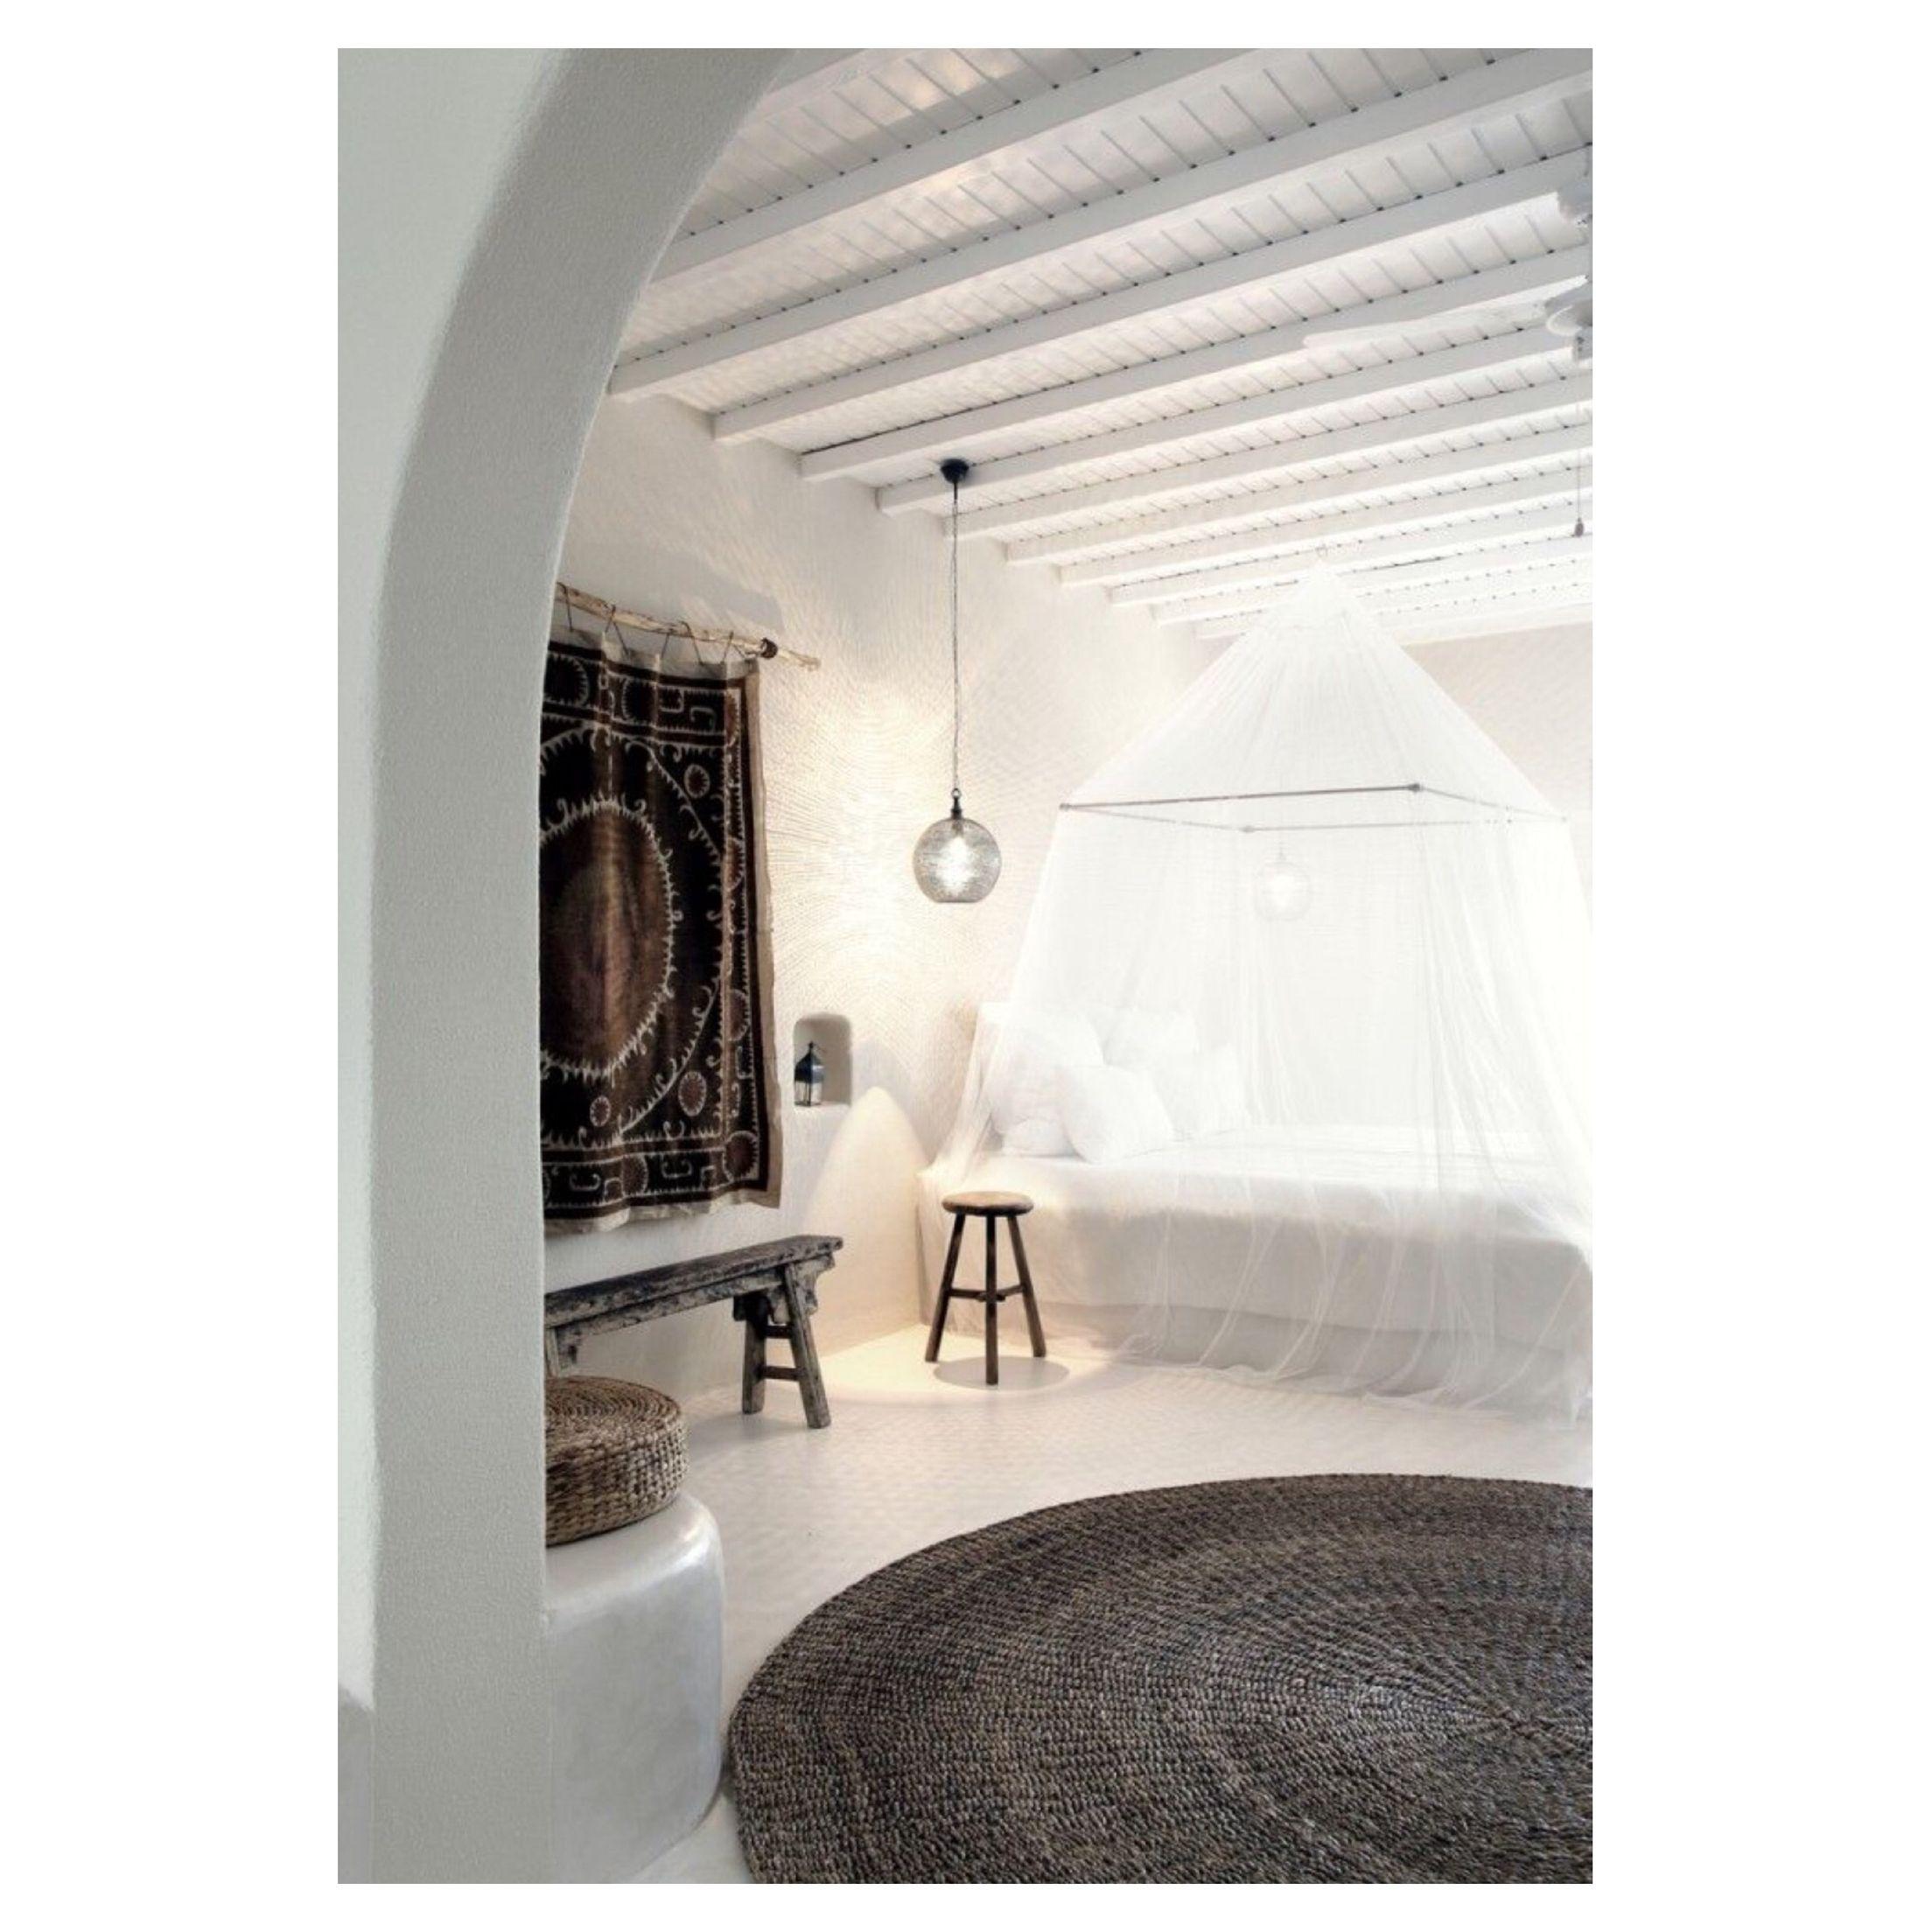 Home, Interior, Home Bedroom